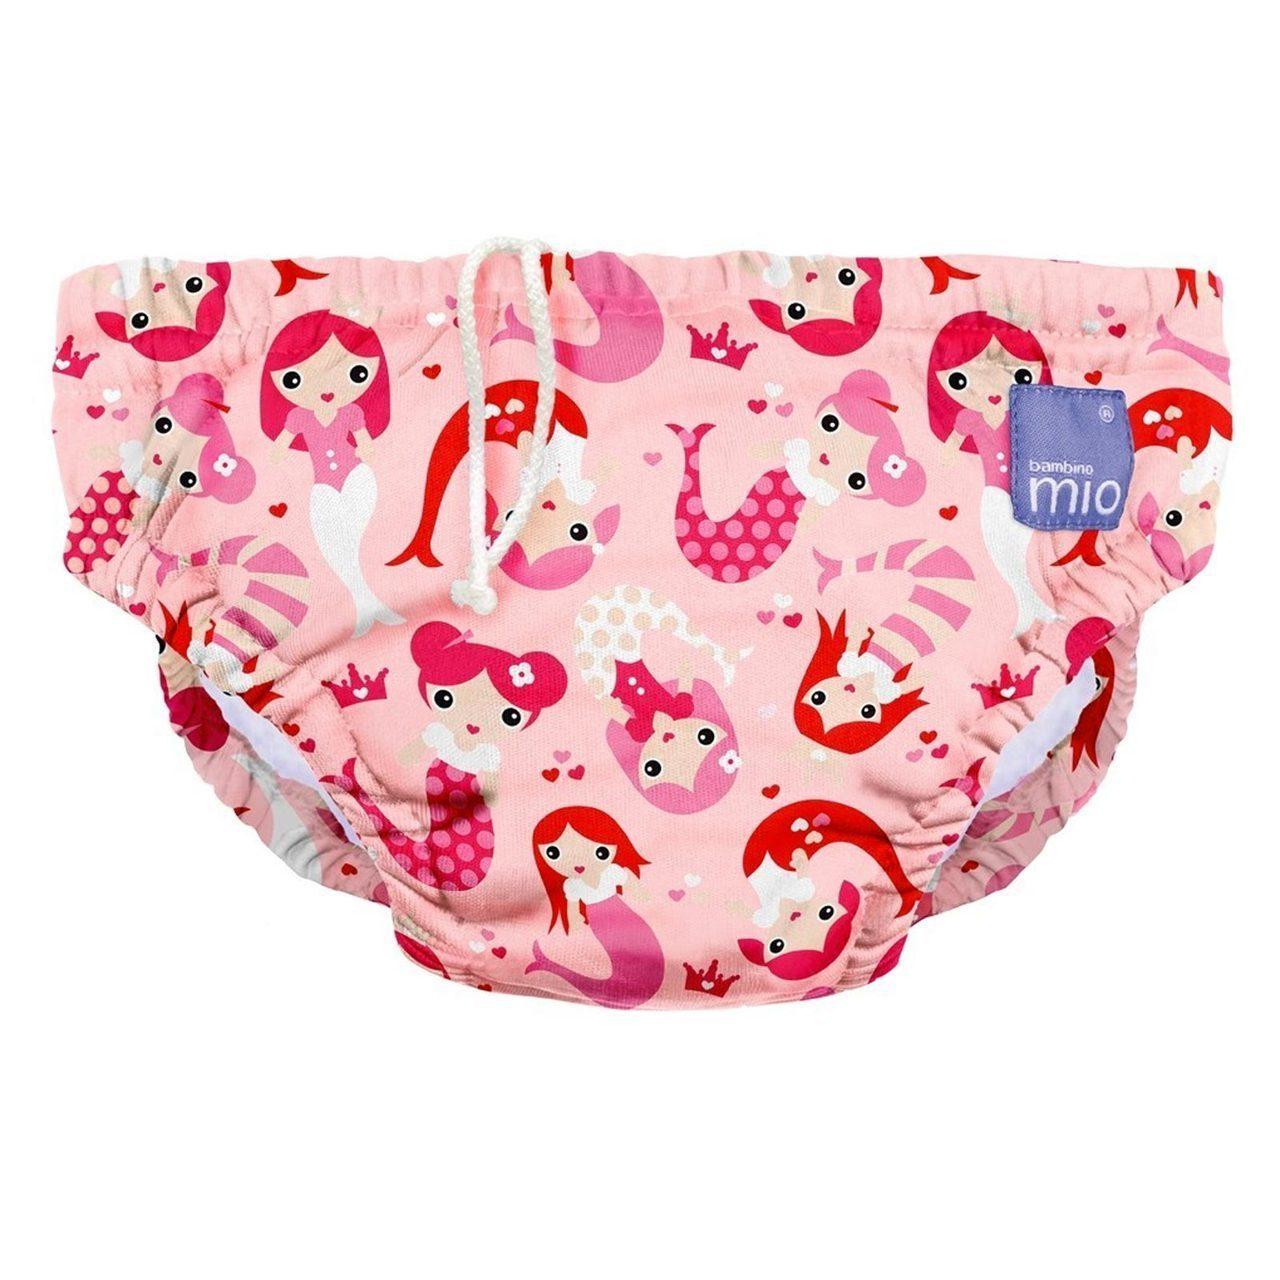 Bambino Mio: Swim Nappies - Mermaid (Large/9-12kg) image